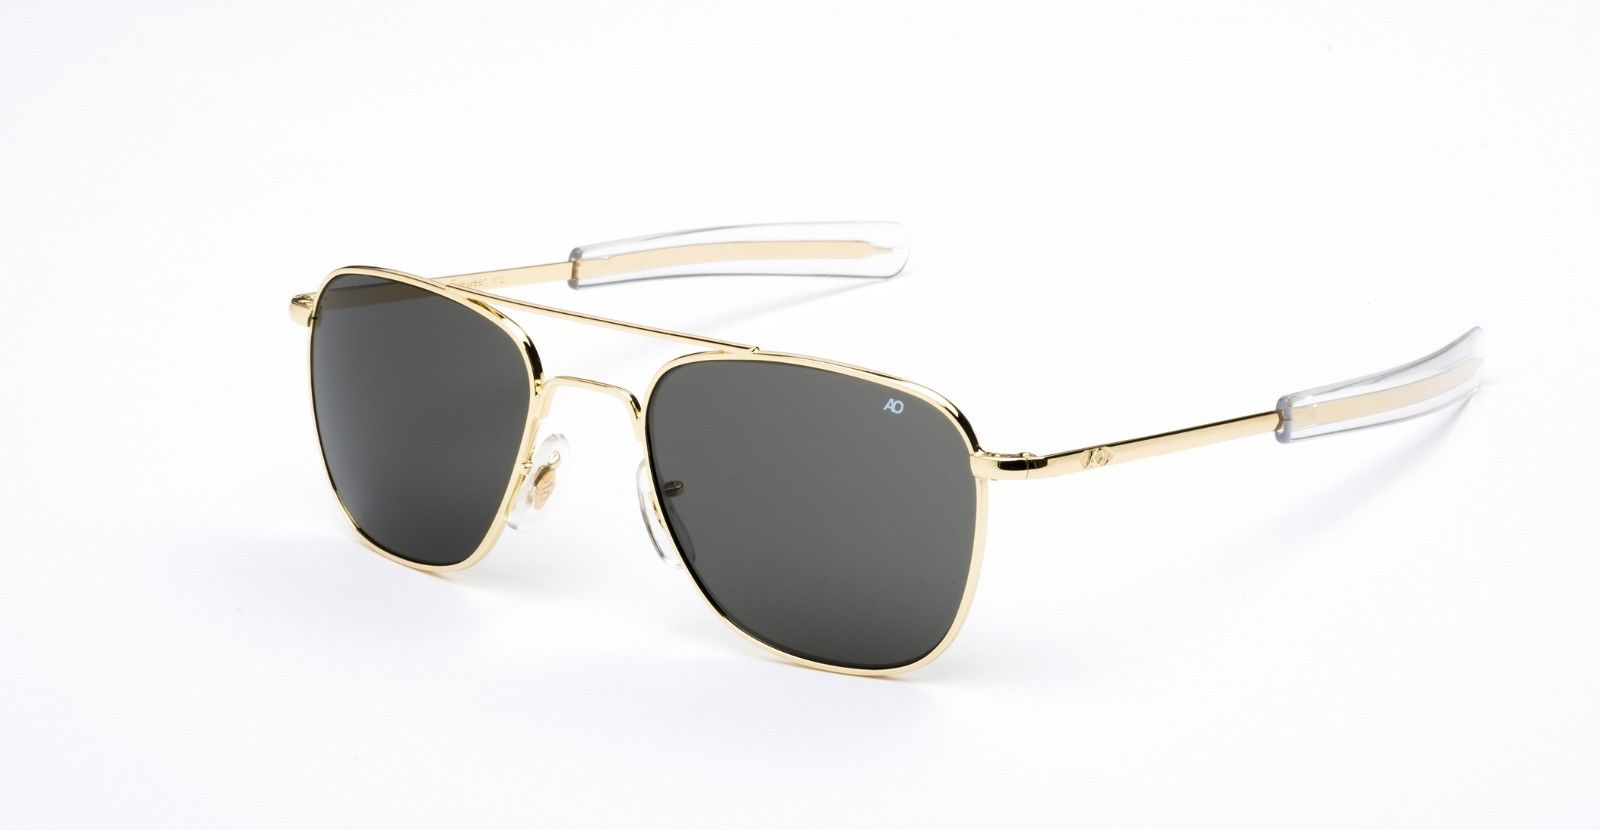 AO American Optical Original Pilot Gold - Made in USA